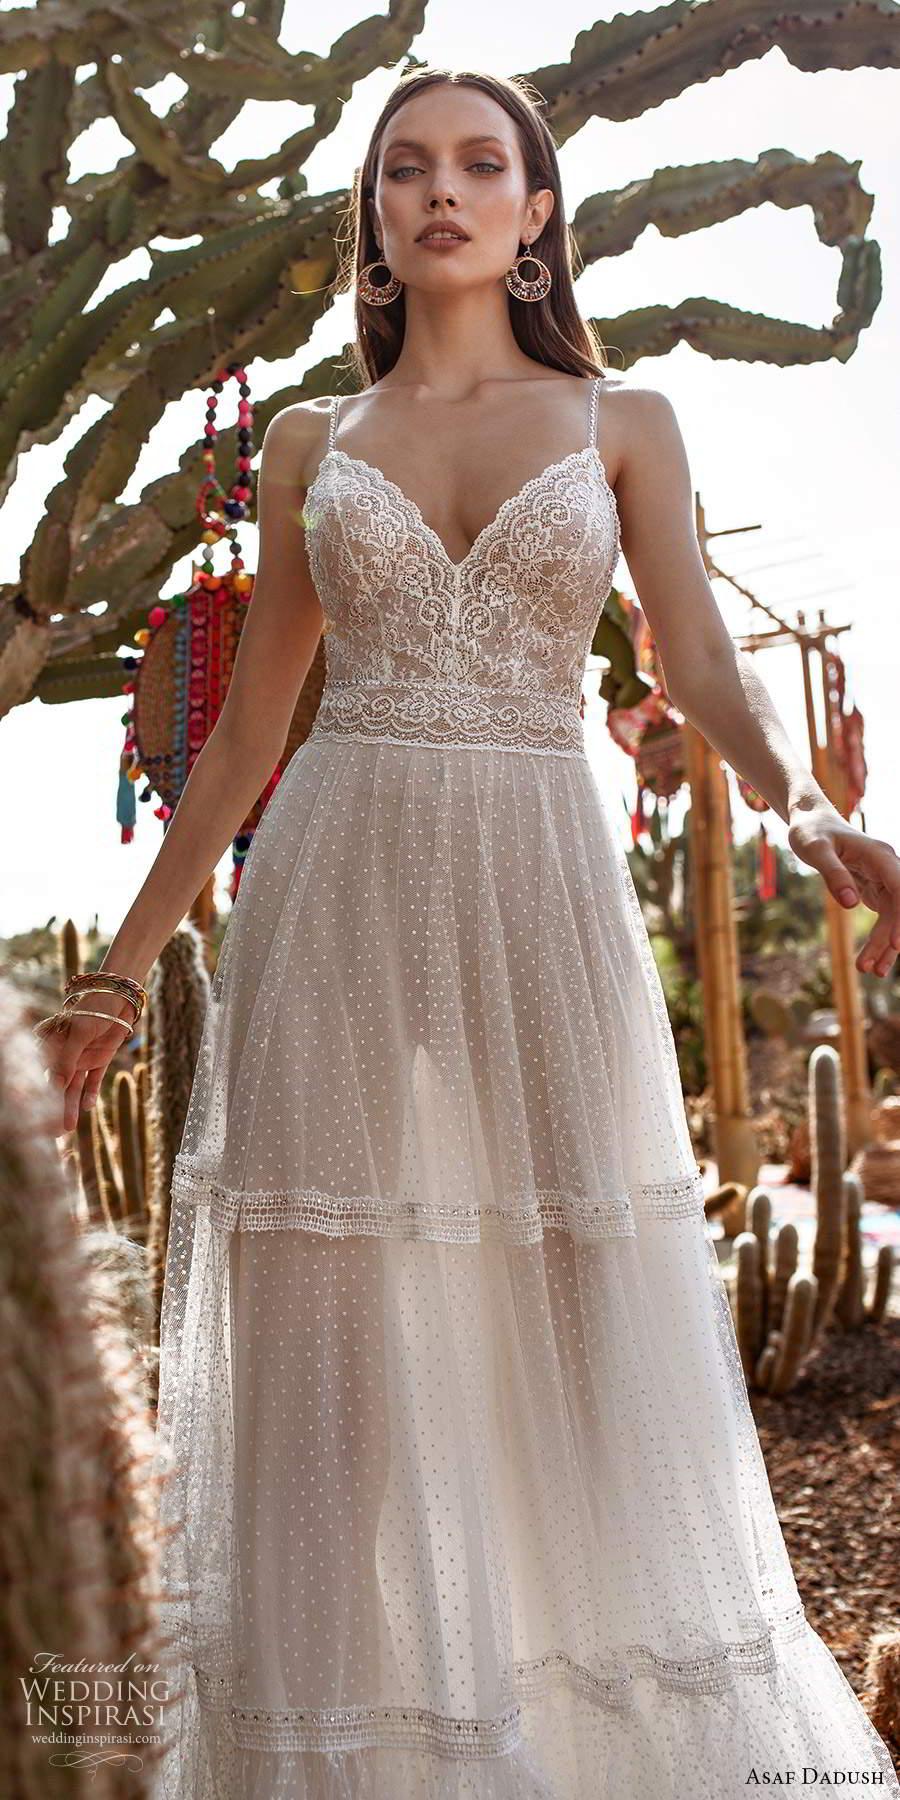 asaf dadush 2020 bridal sleeveless thin beaded straps sweetheart neckline fully embellished a line wedding dress low back (6) zv